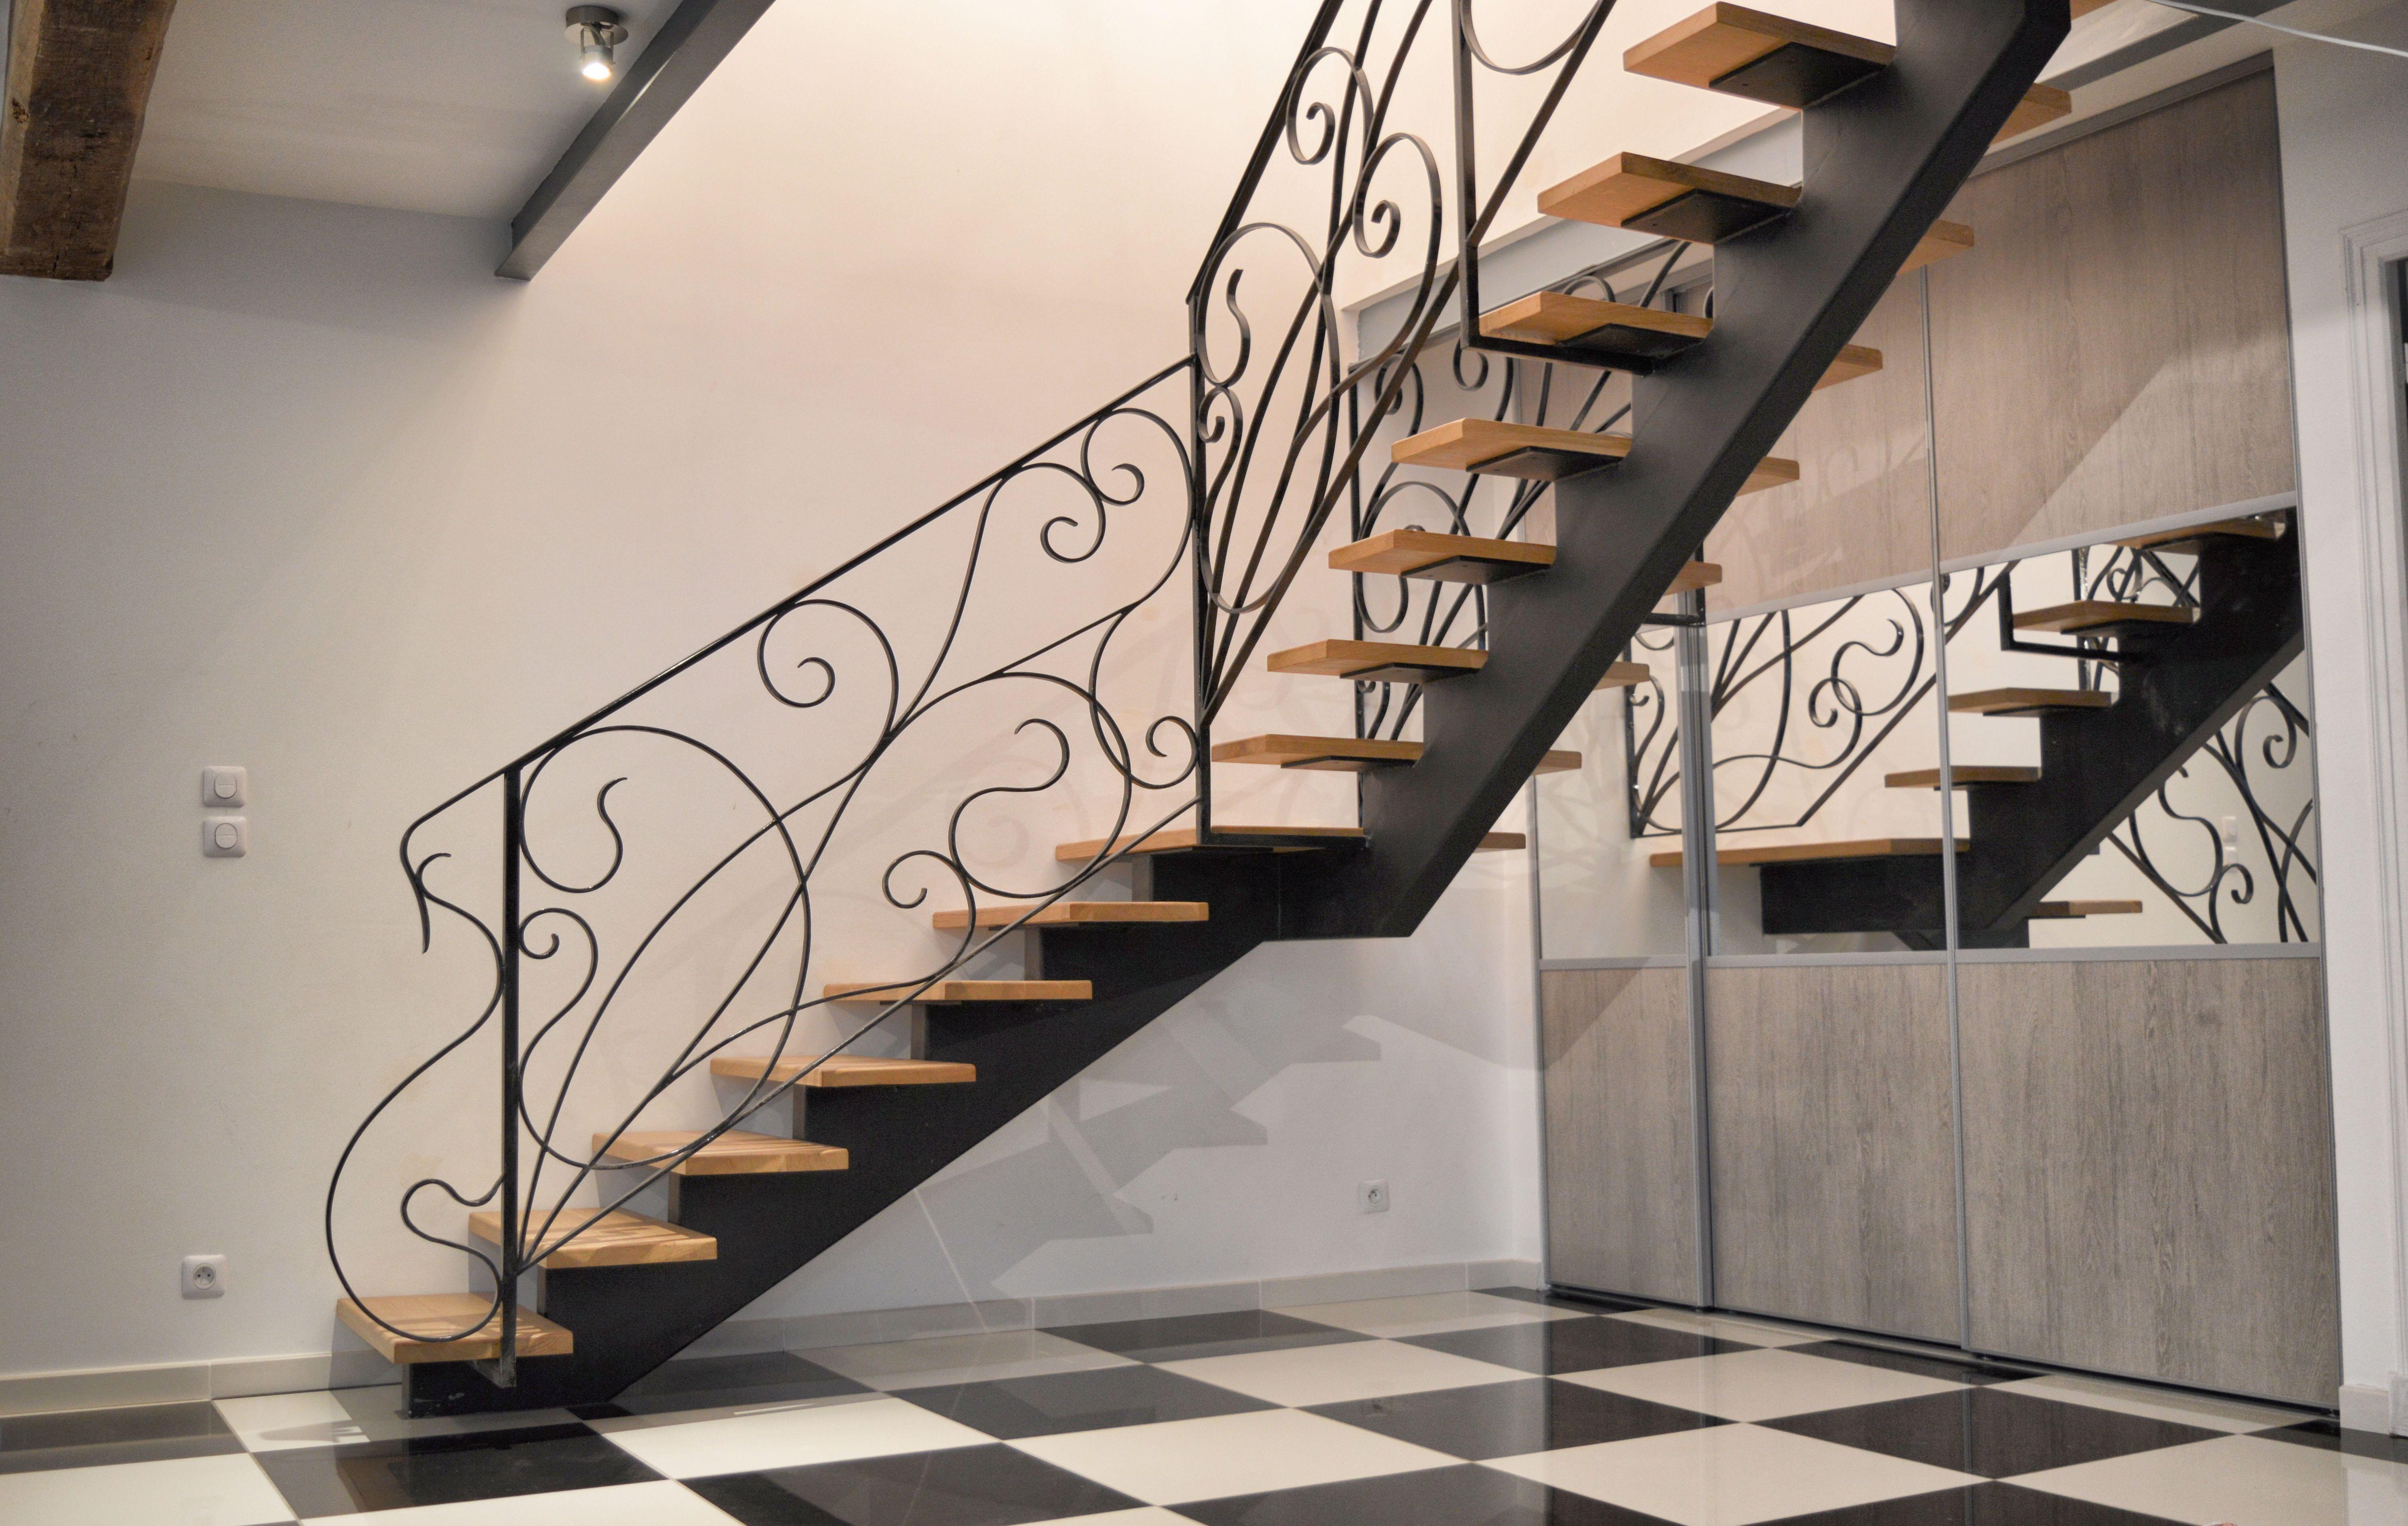 Epingle Par Jane Oliveira Sur Escada Escolhida En 2020 Rampe